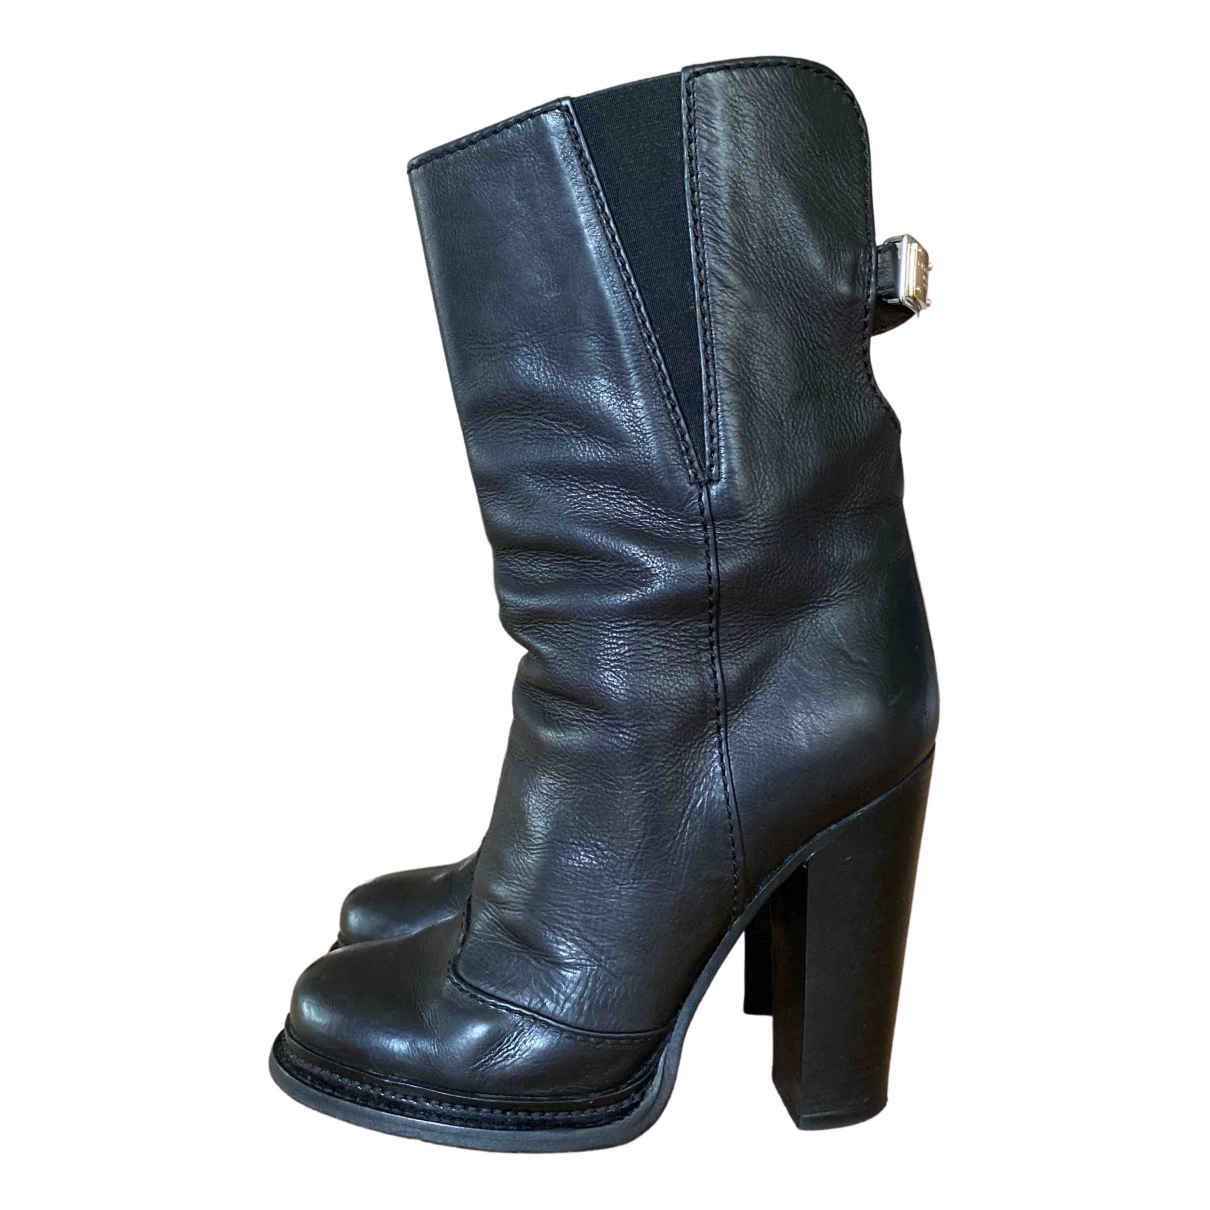 Dolce & Gabbana \N Black Leather Boots for Women 38 EU